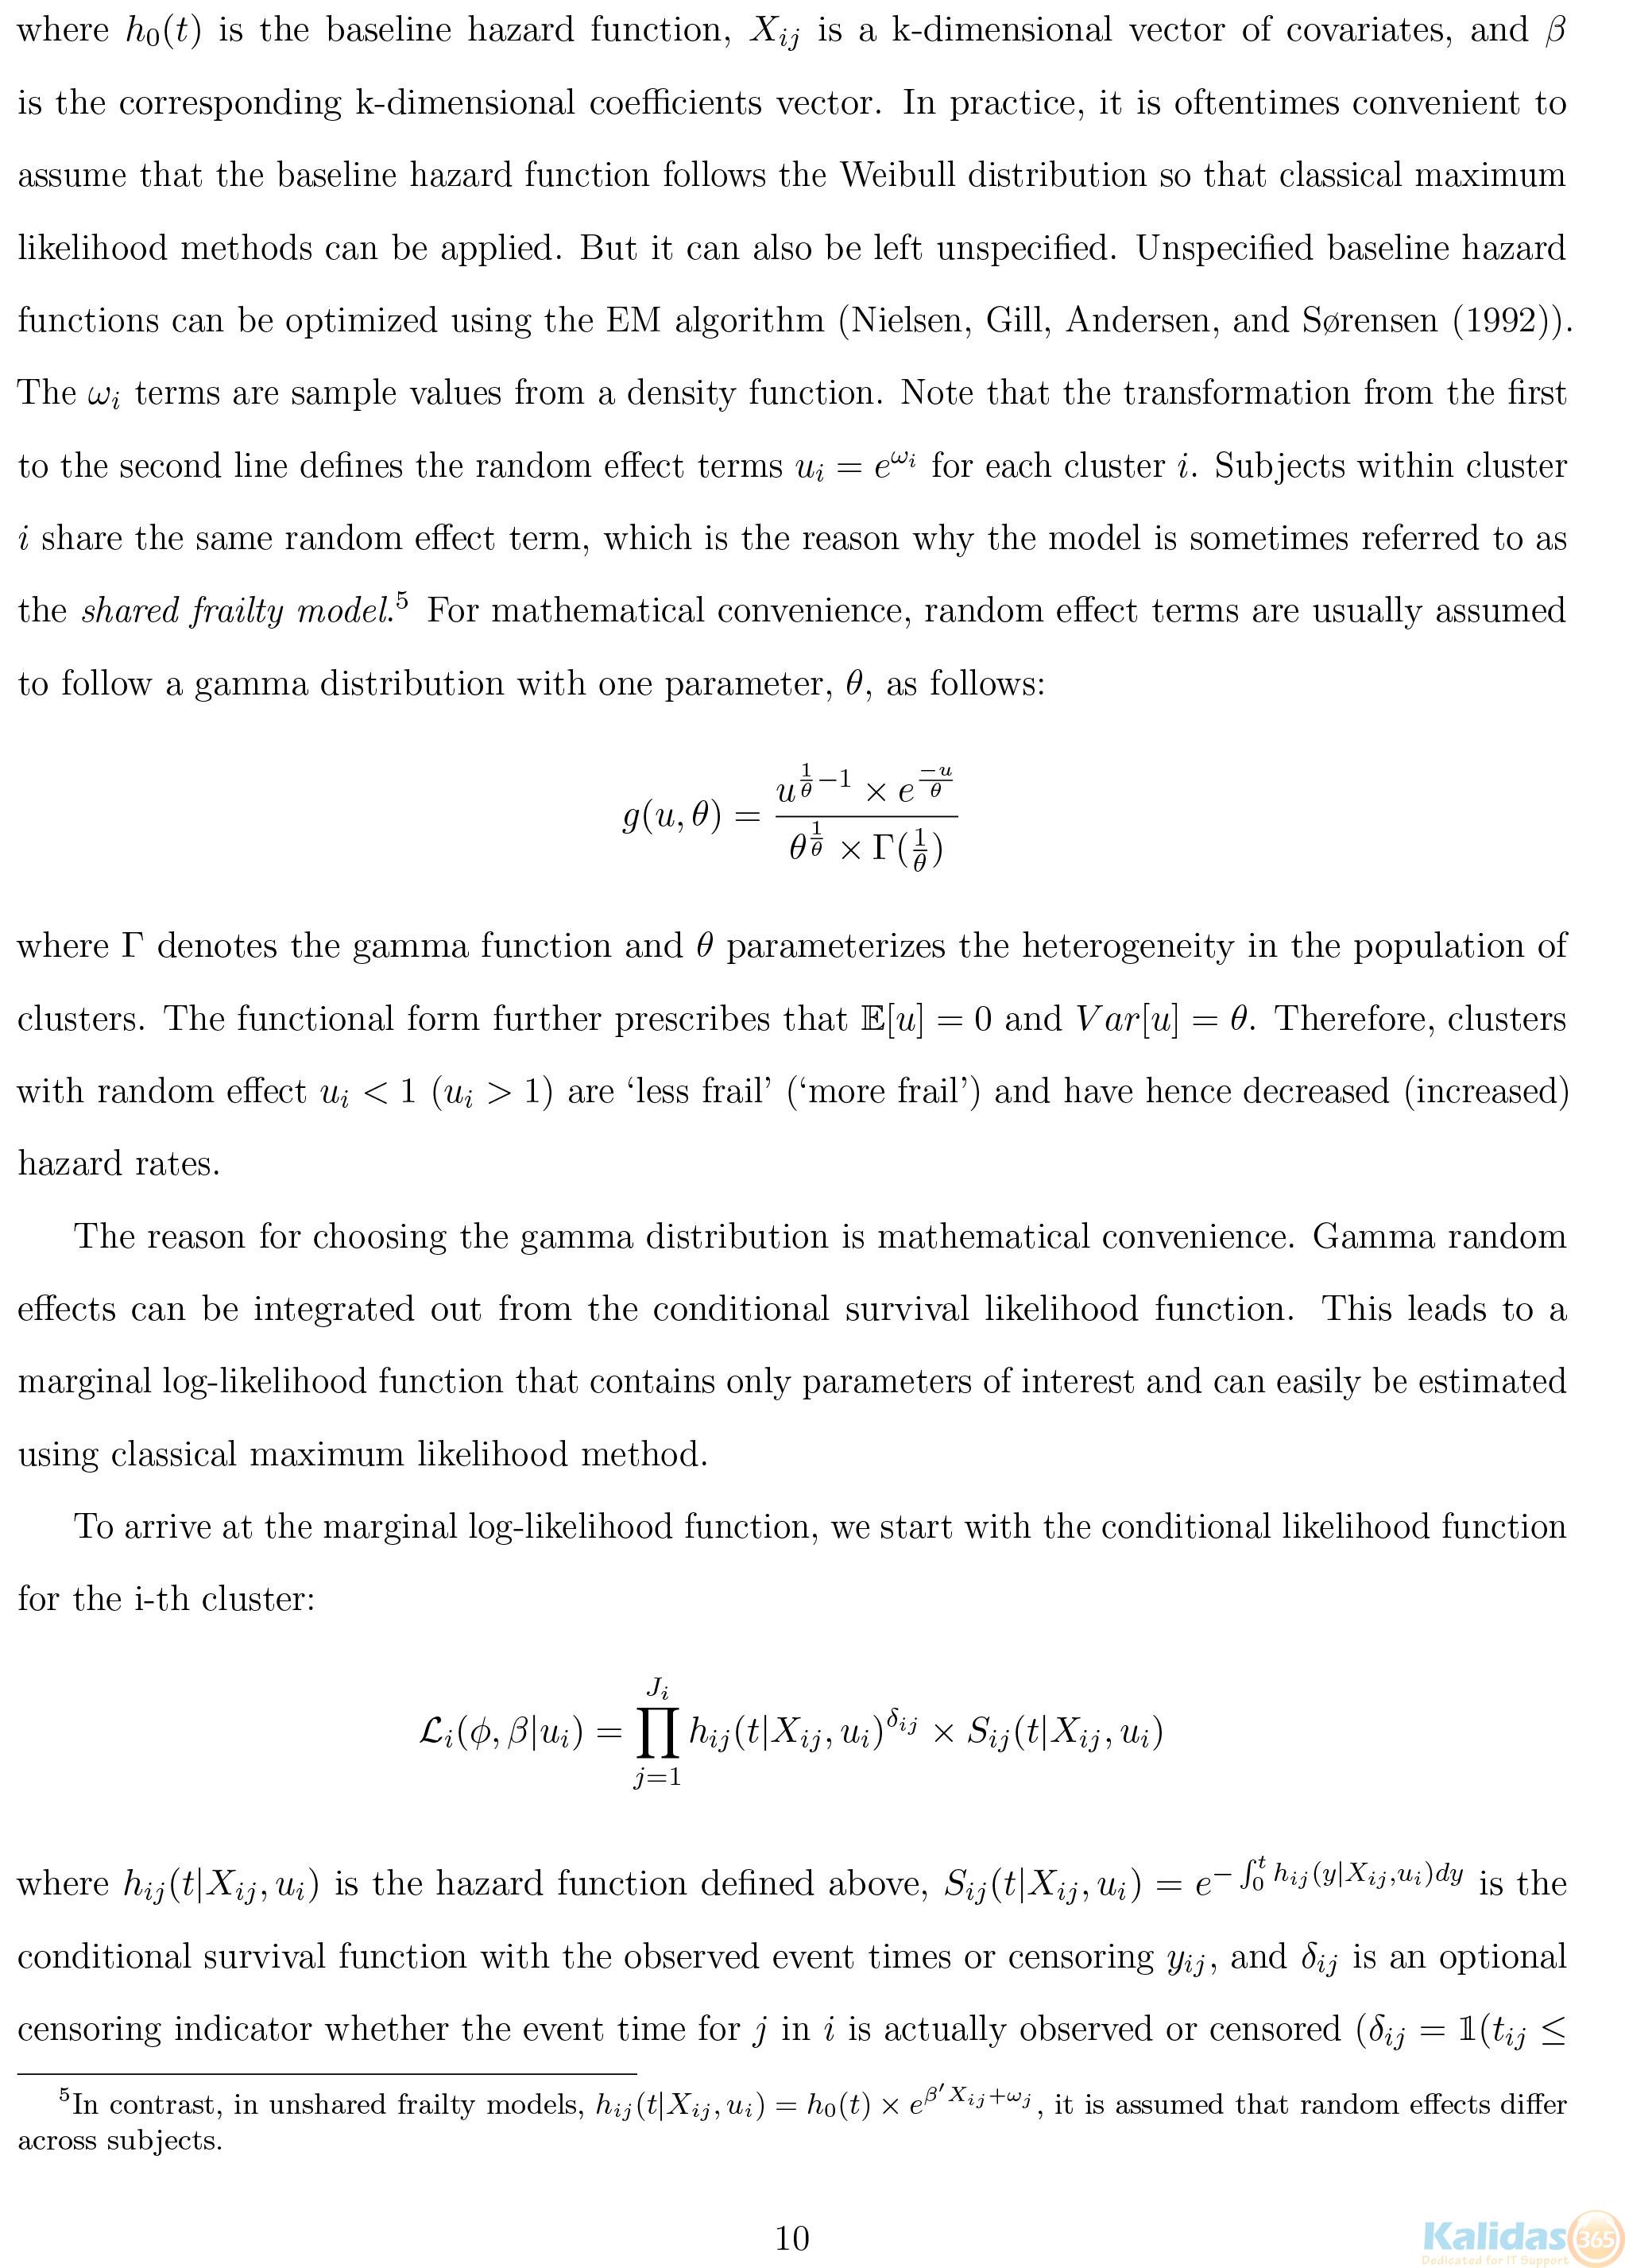 Time2Event_Manuscript-10